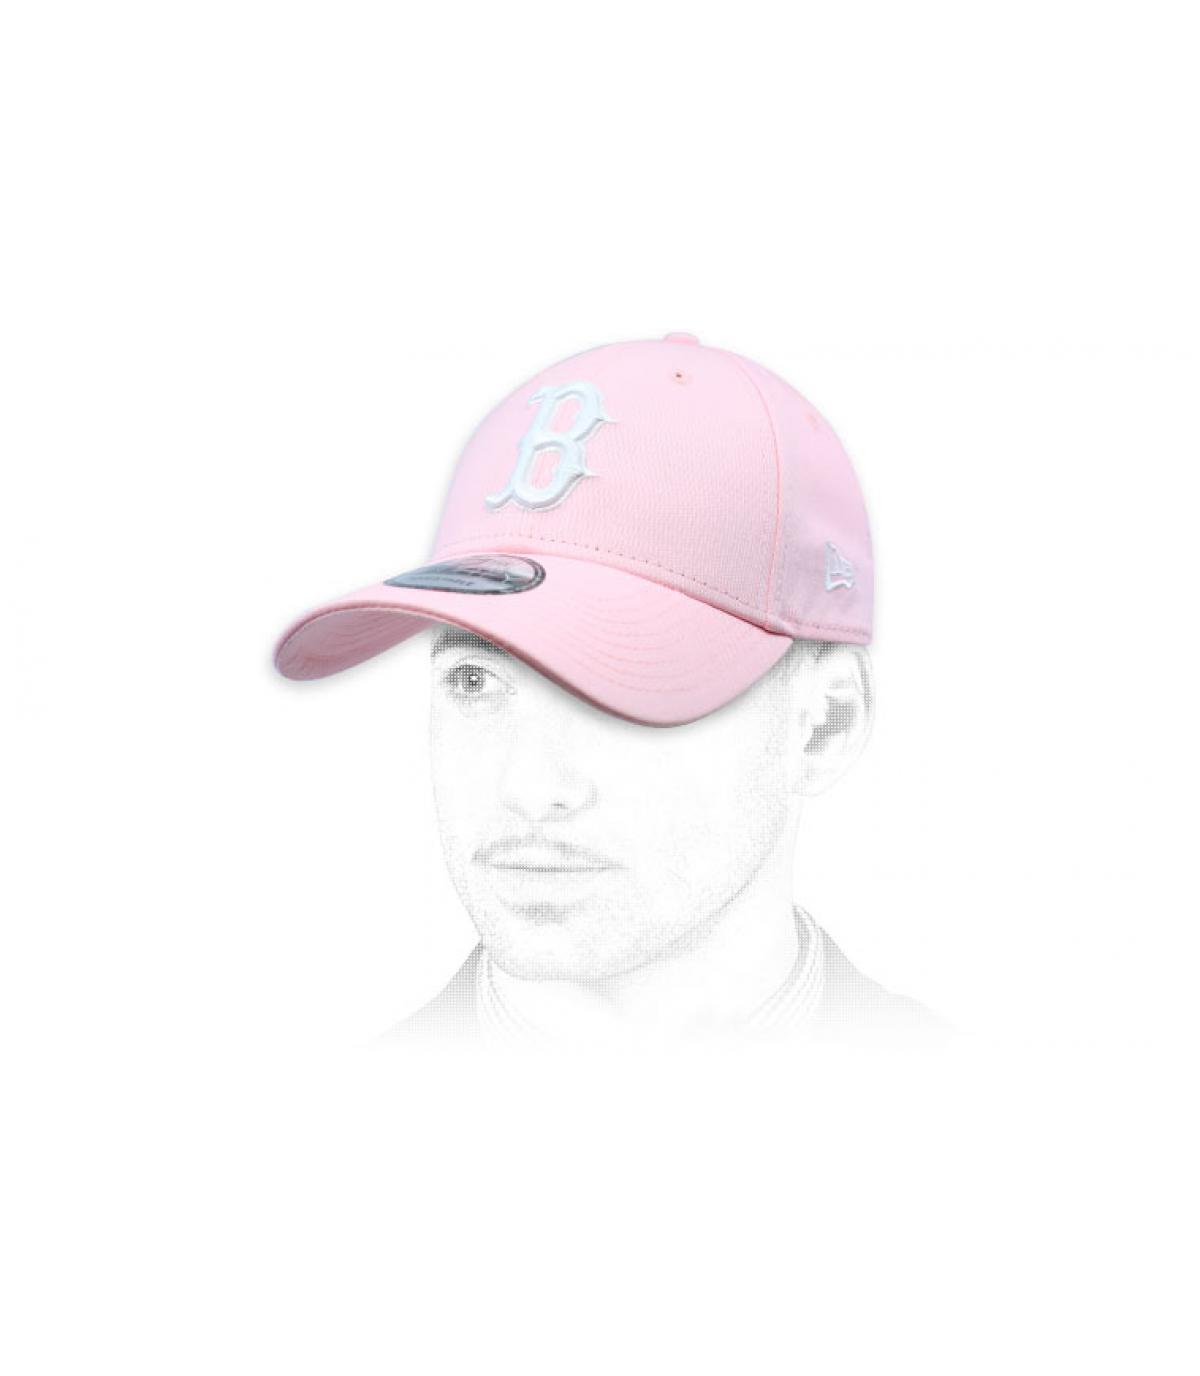 gorra B rosa blanco